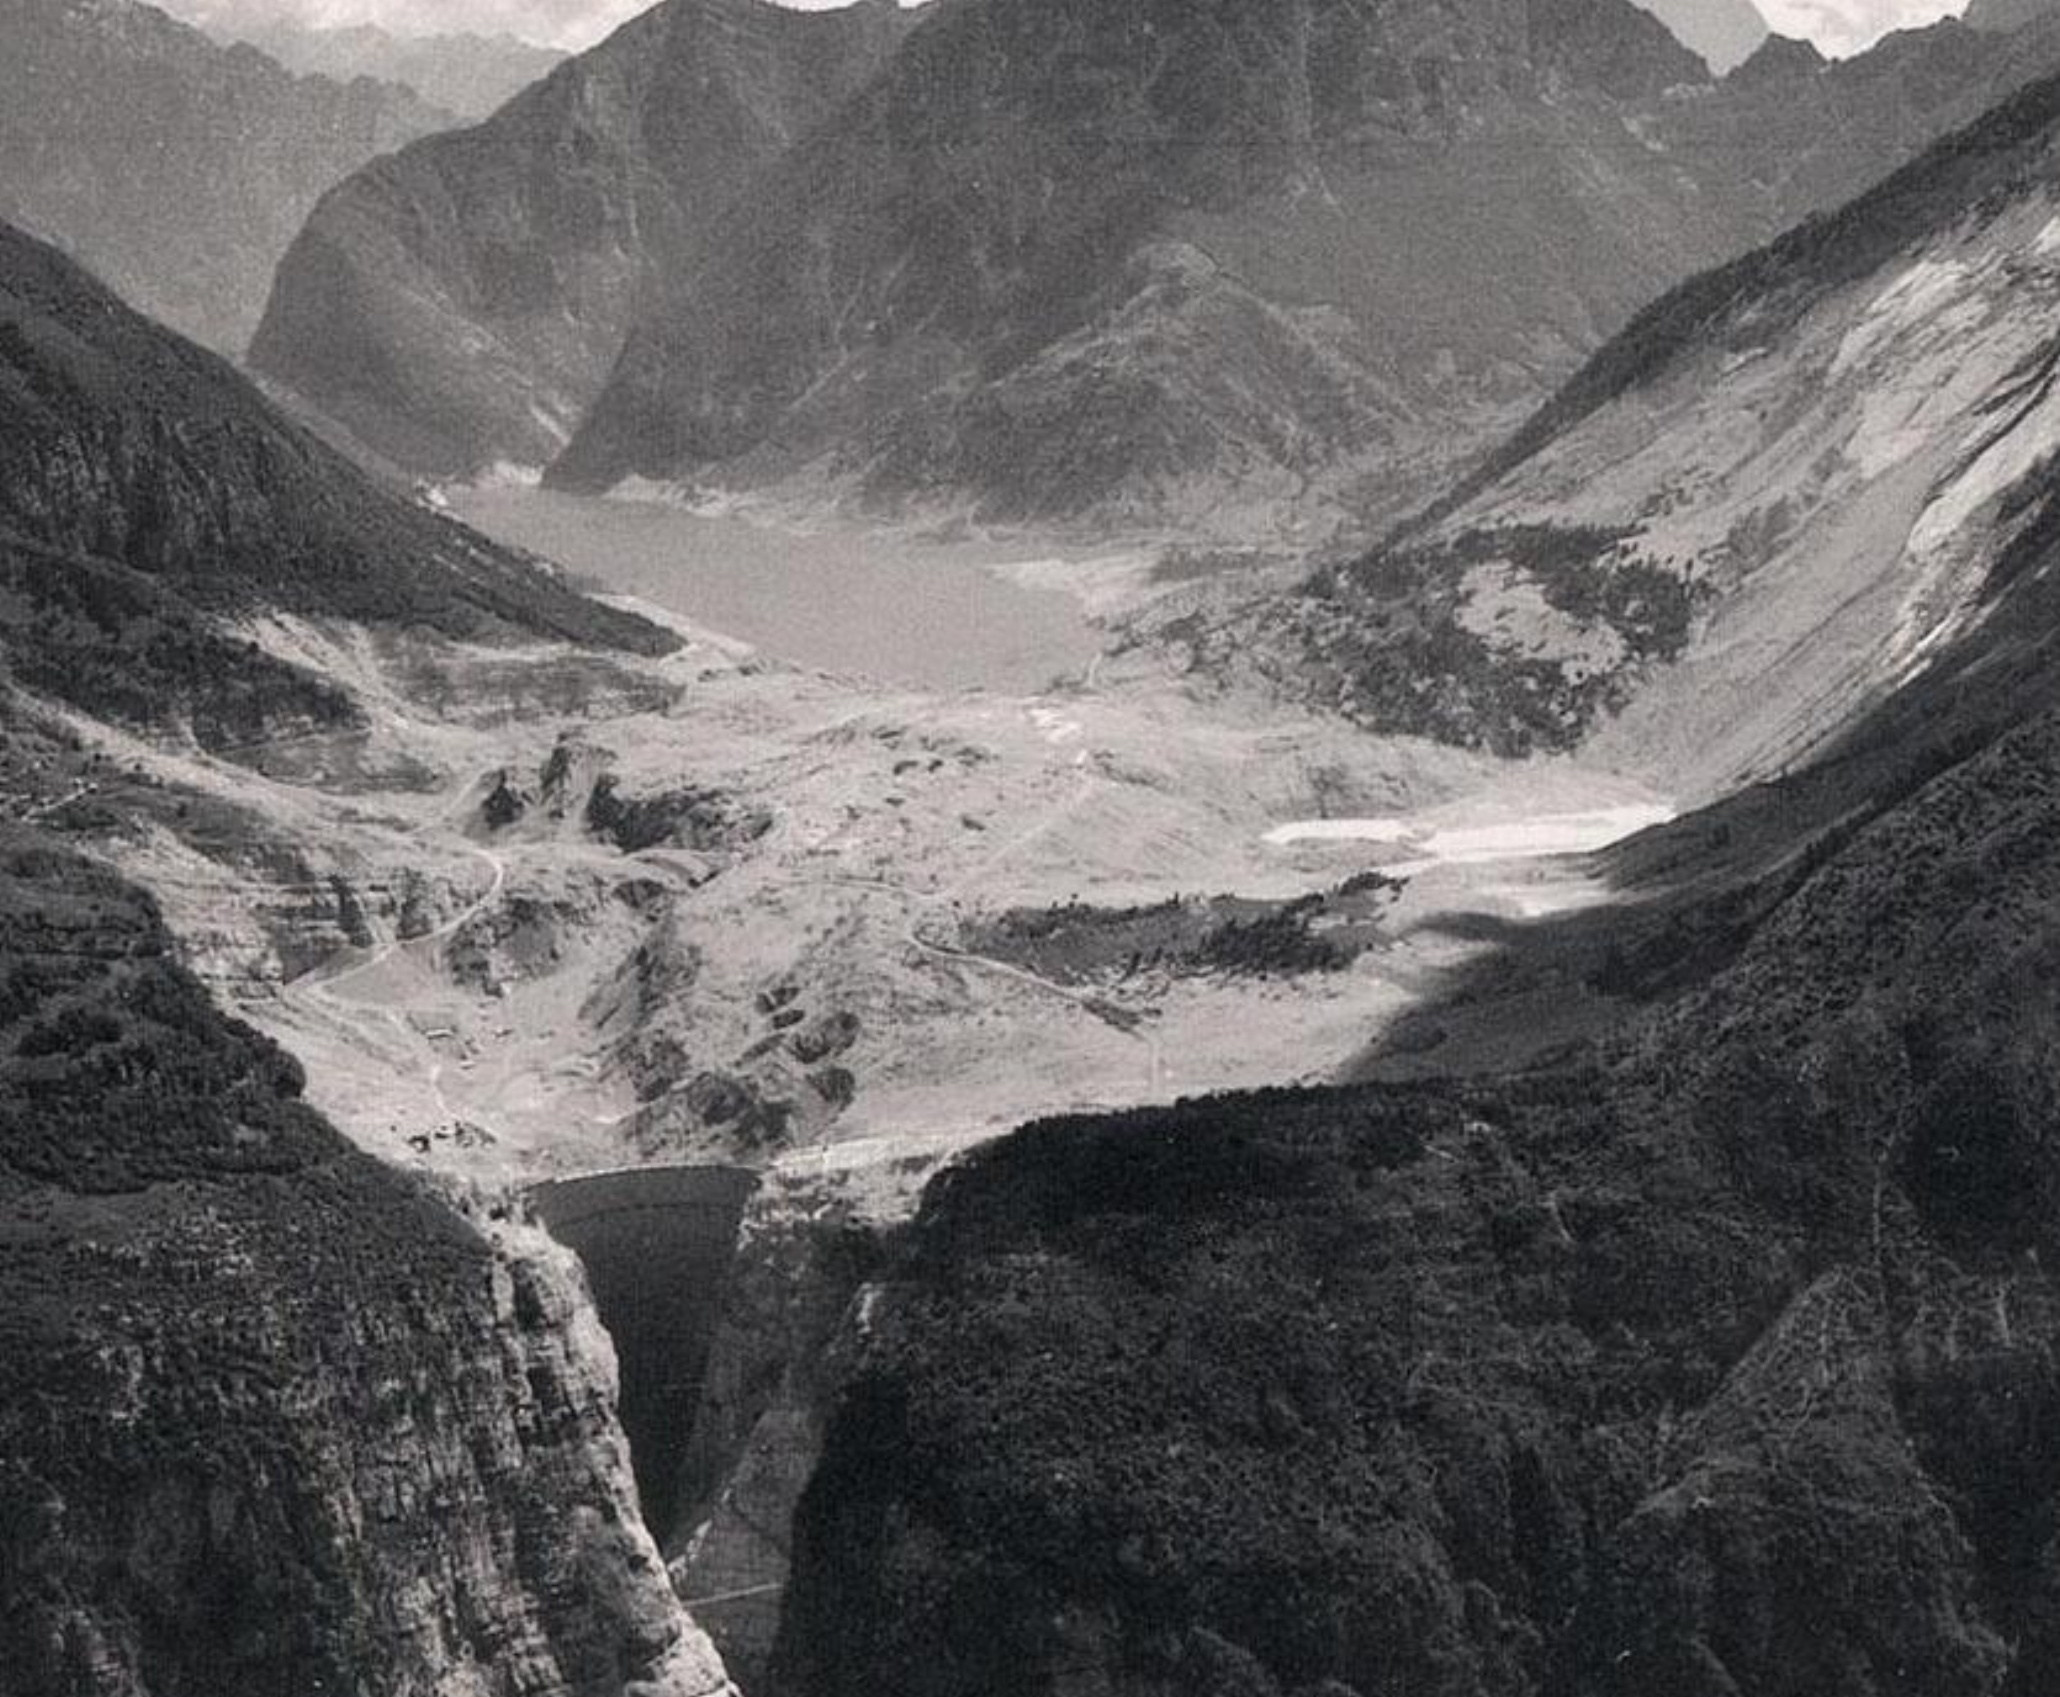 1963/10/09 PM10:25